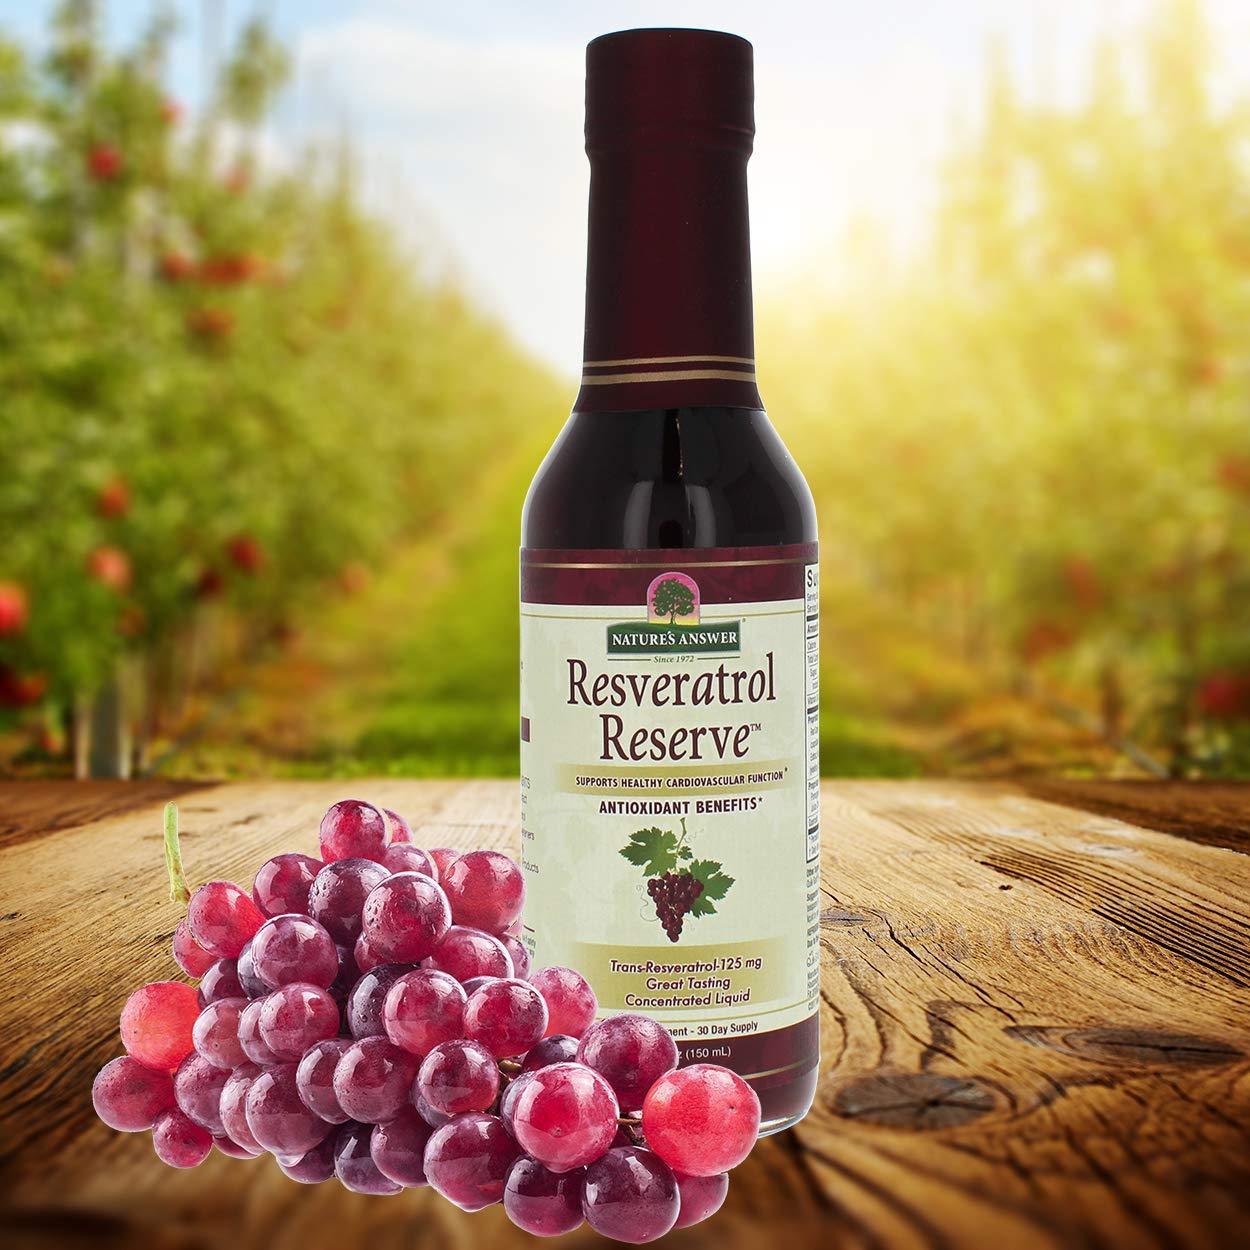 Nature's Answer Alcohol-Free Resveratrol Reserve